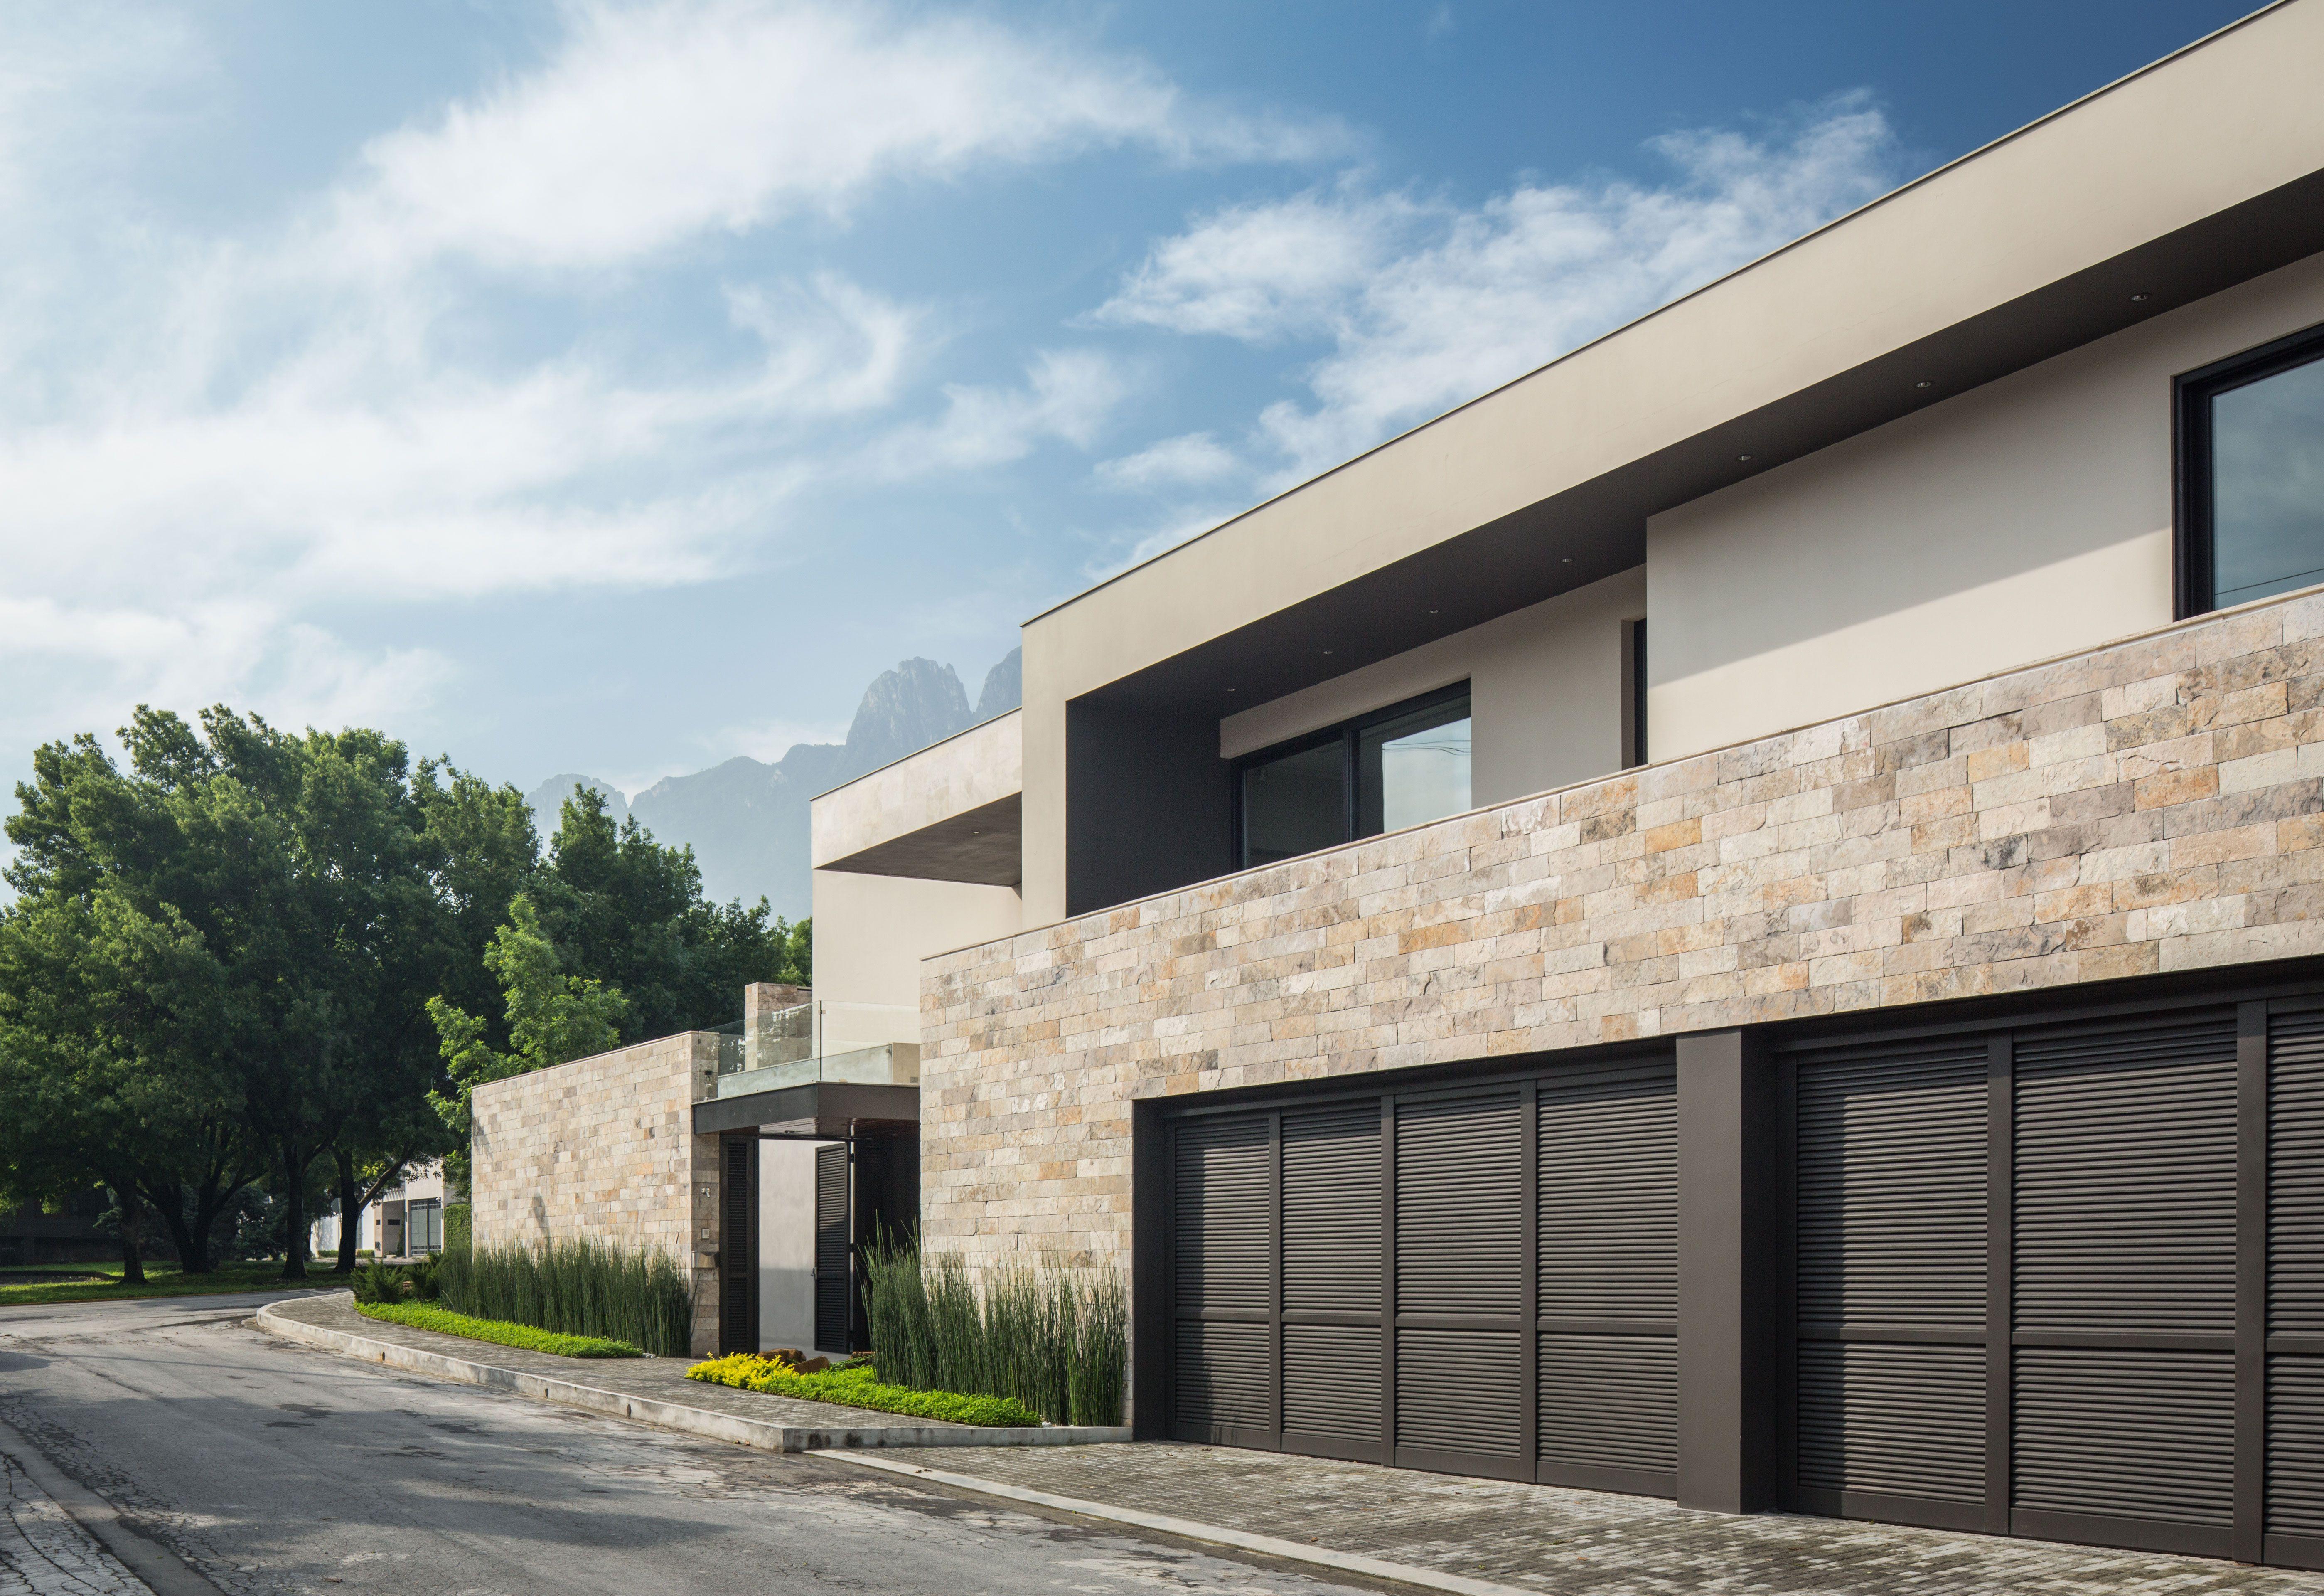 Architecture architect house pozas arquitectos elegance